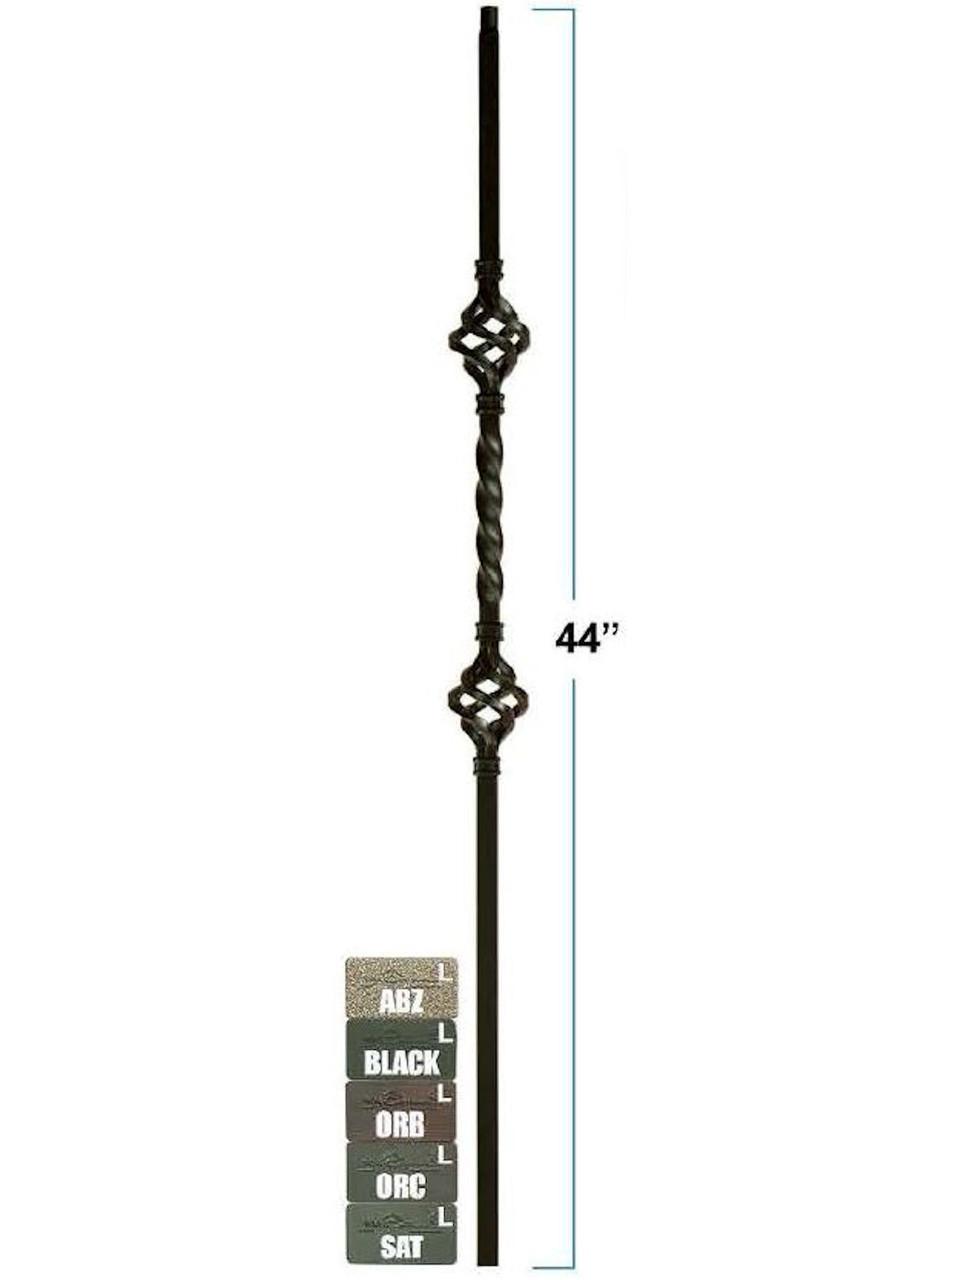 2853 Mega Double Basket Single Twist Tubular Steel Baluster, 3/4-inch (19mm)